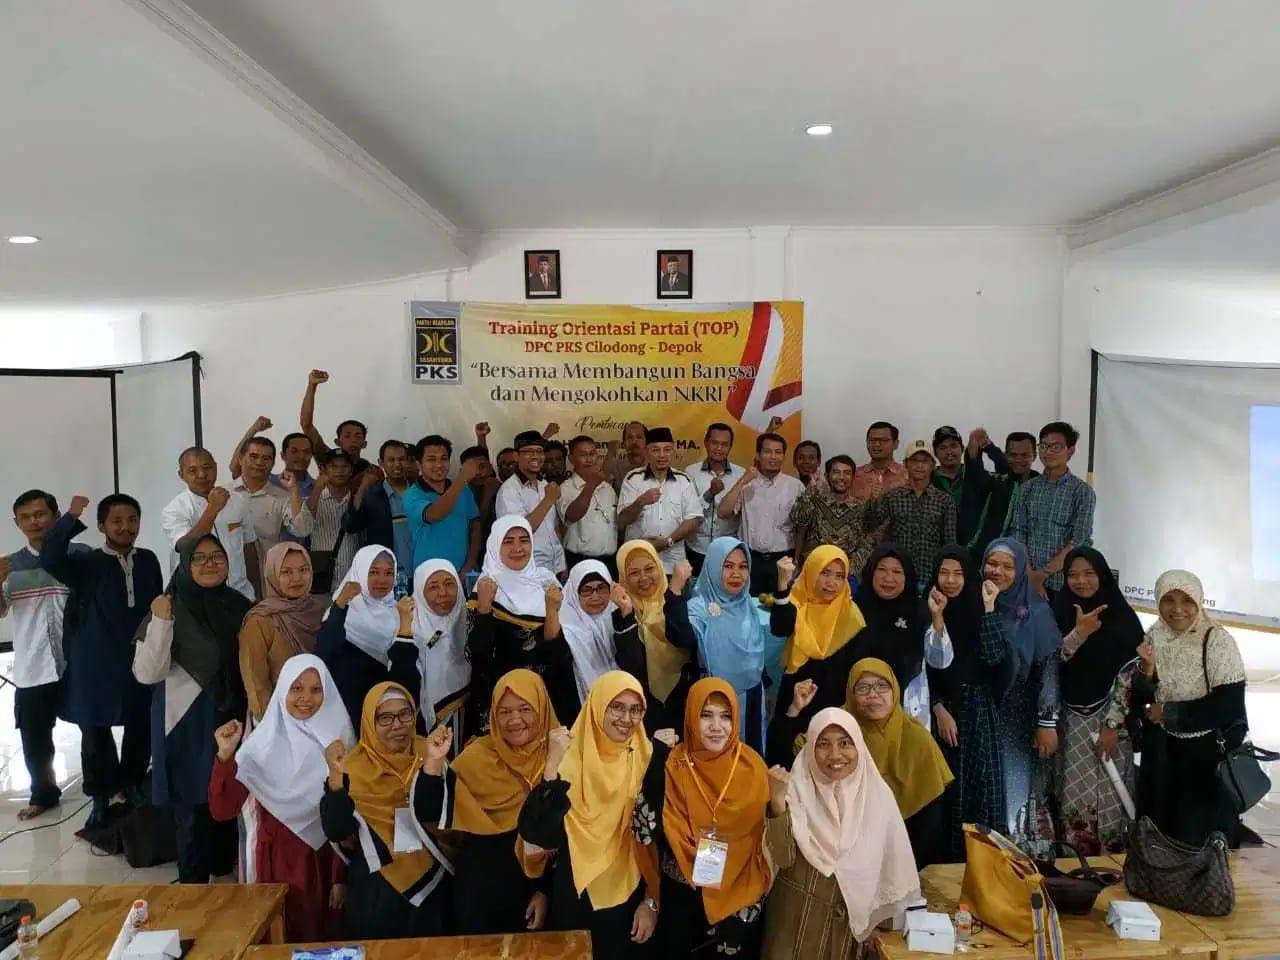 DPC PKS Cilodong Gelar Training Orientasi Partai Untuk Kader Baru